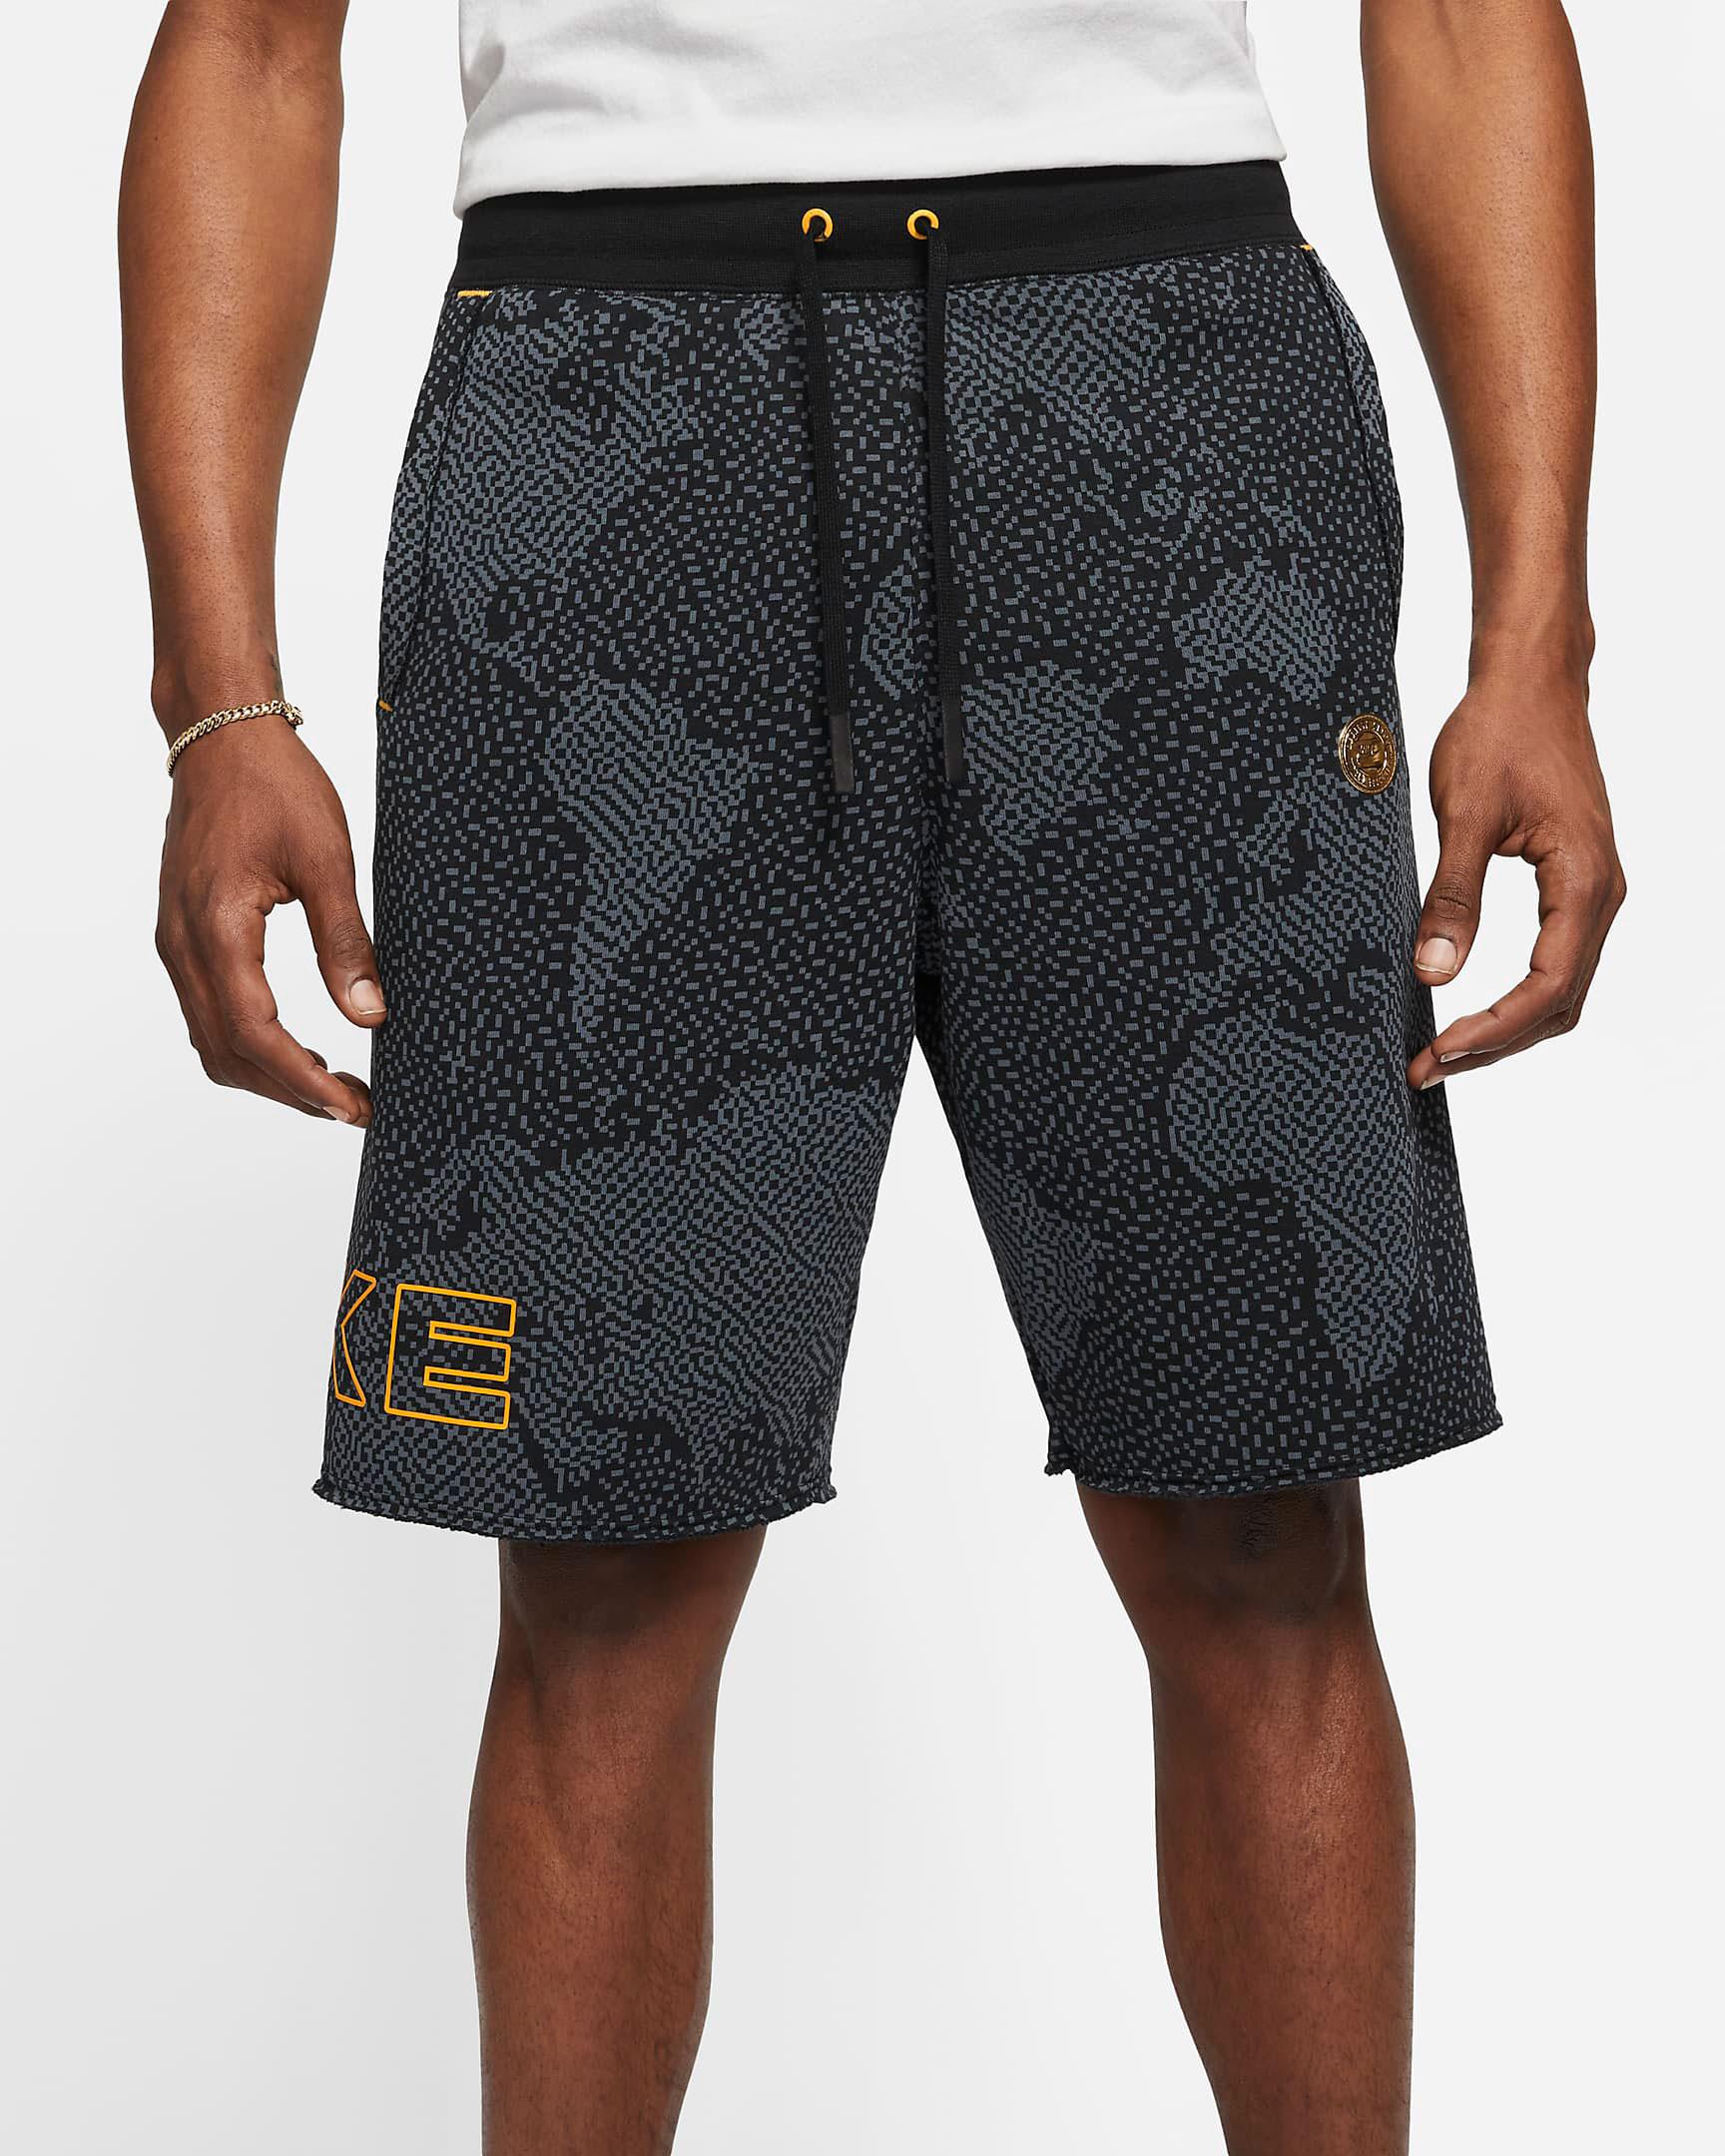 jordan-9-university-gold-nike-shorts-1